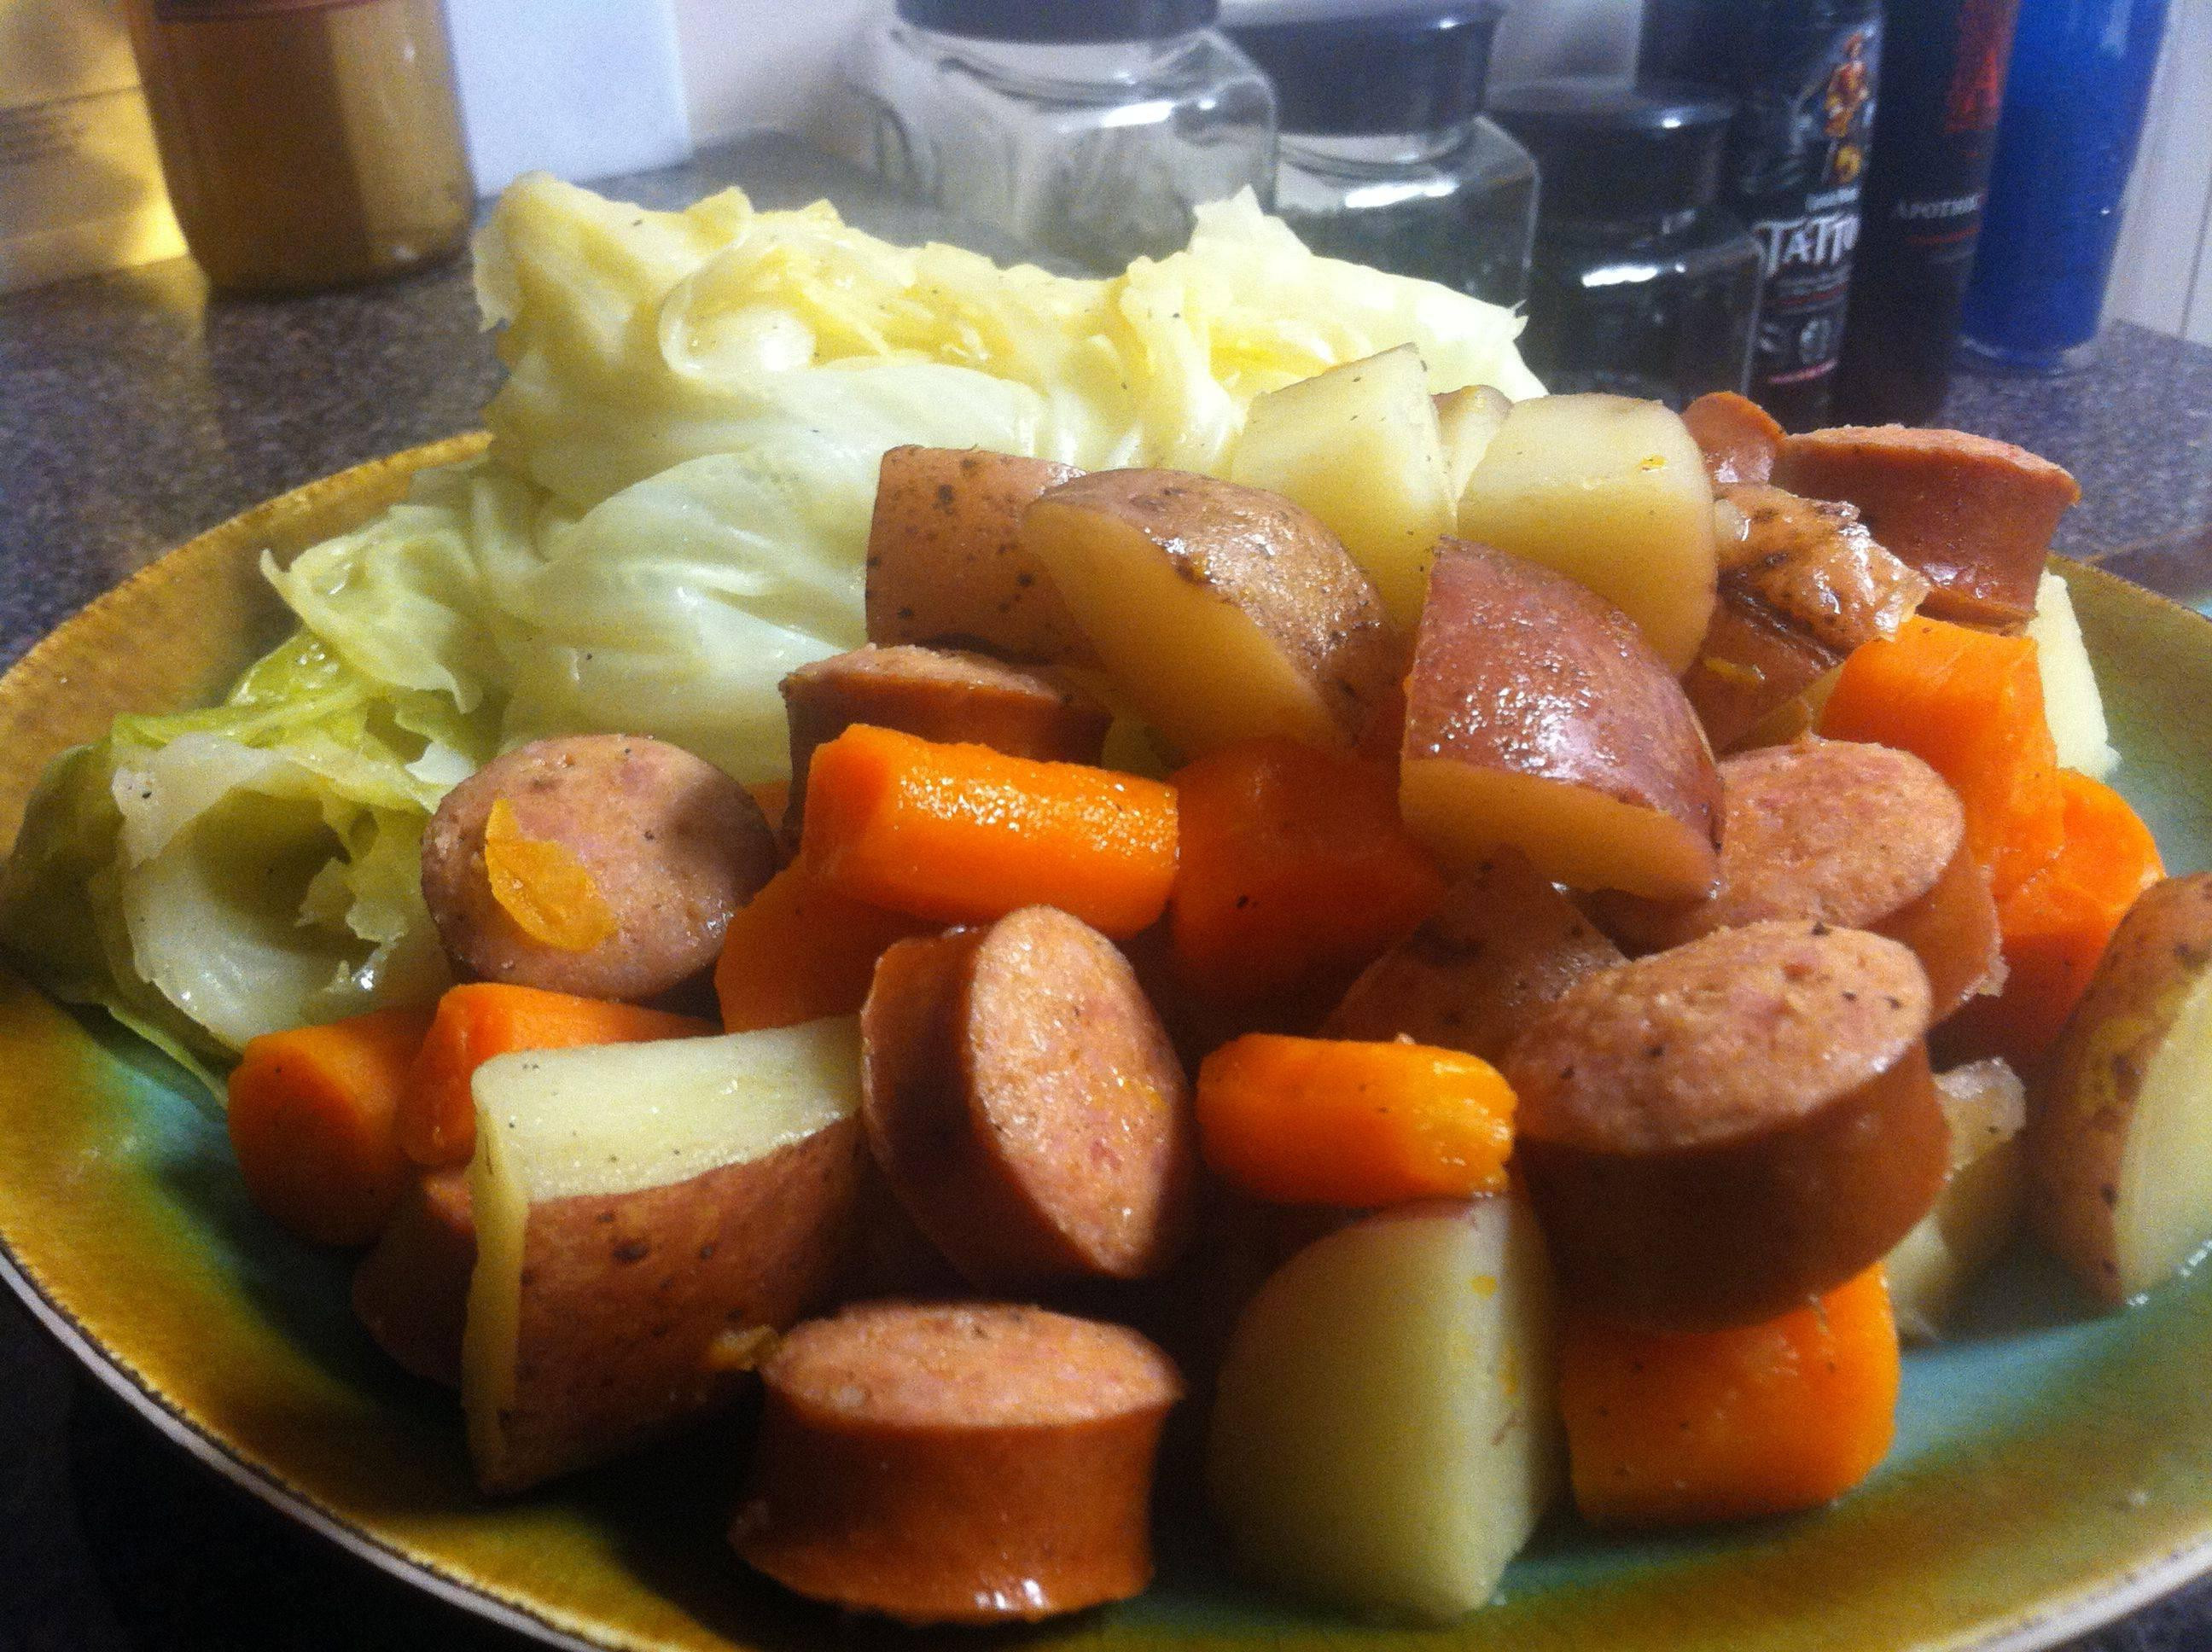 Boiled Dinner Recipe  boiled dinner recipe with kielbasa